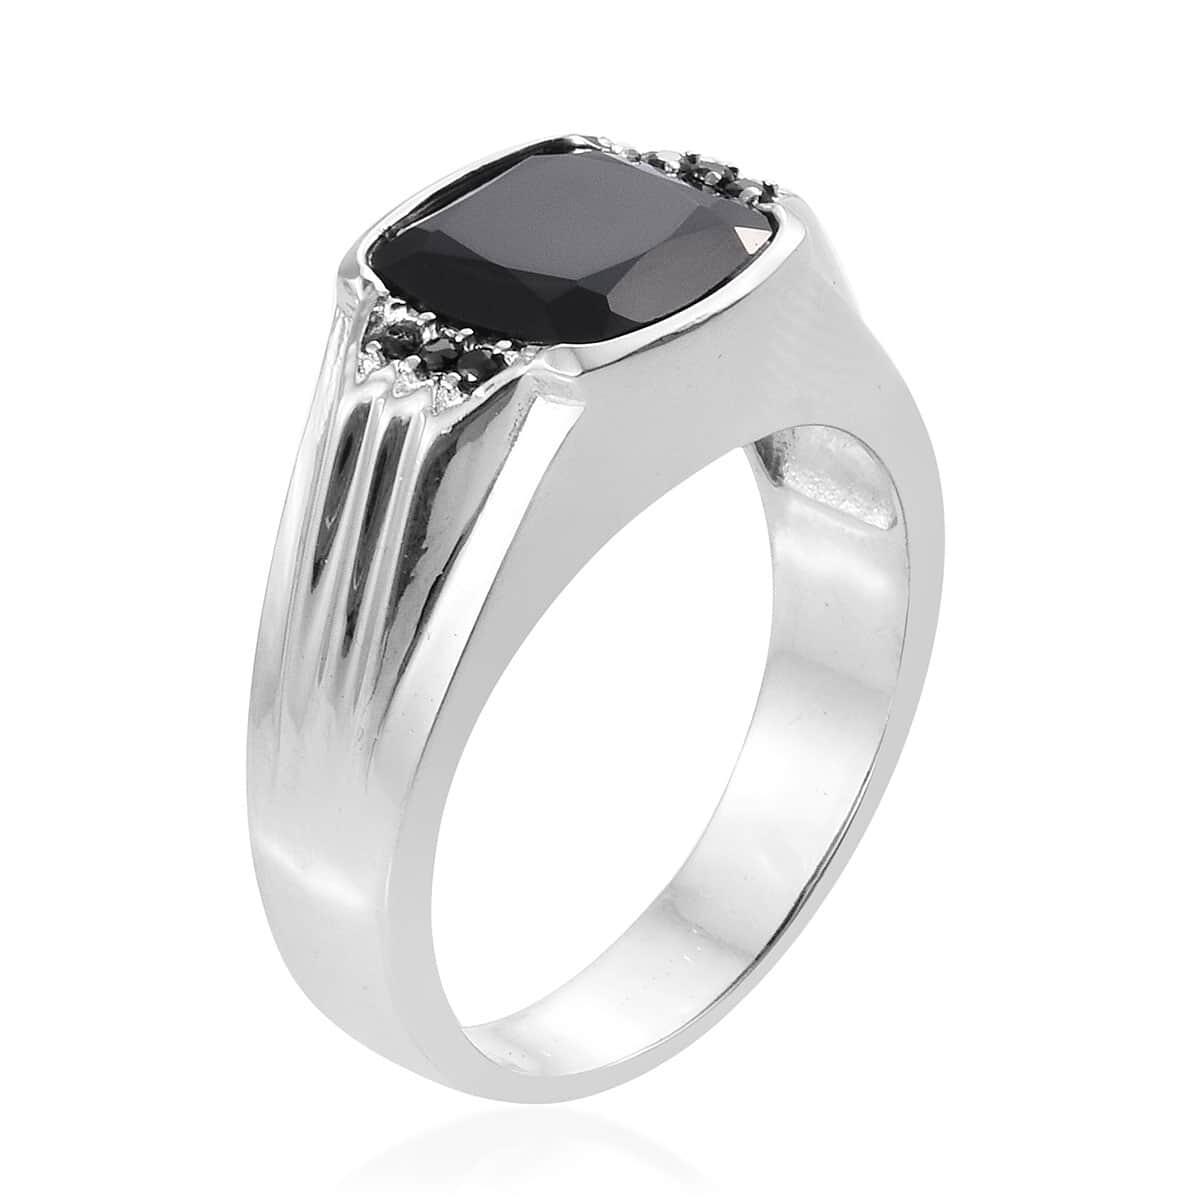 Thai Black Spinel Stainless Steel Men's Ring (Size 12.0) 6.12 ctw